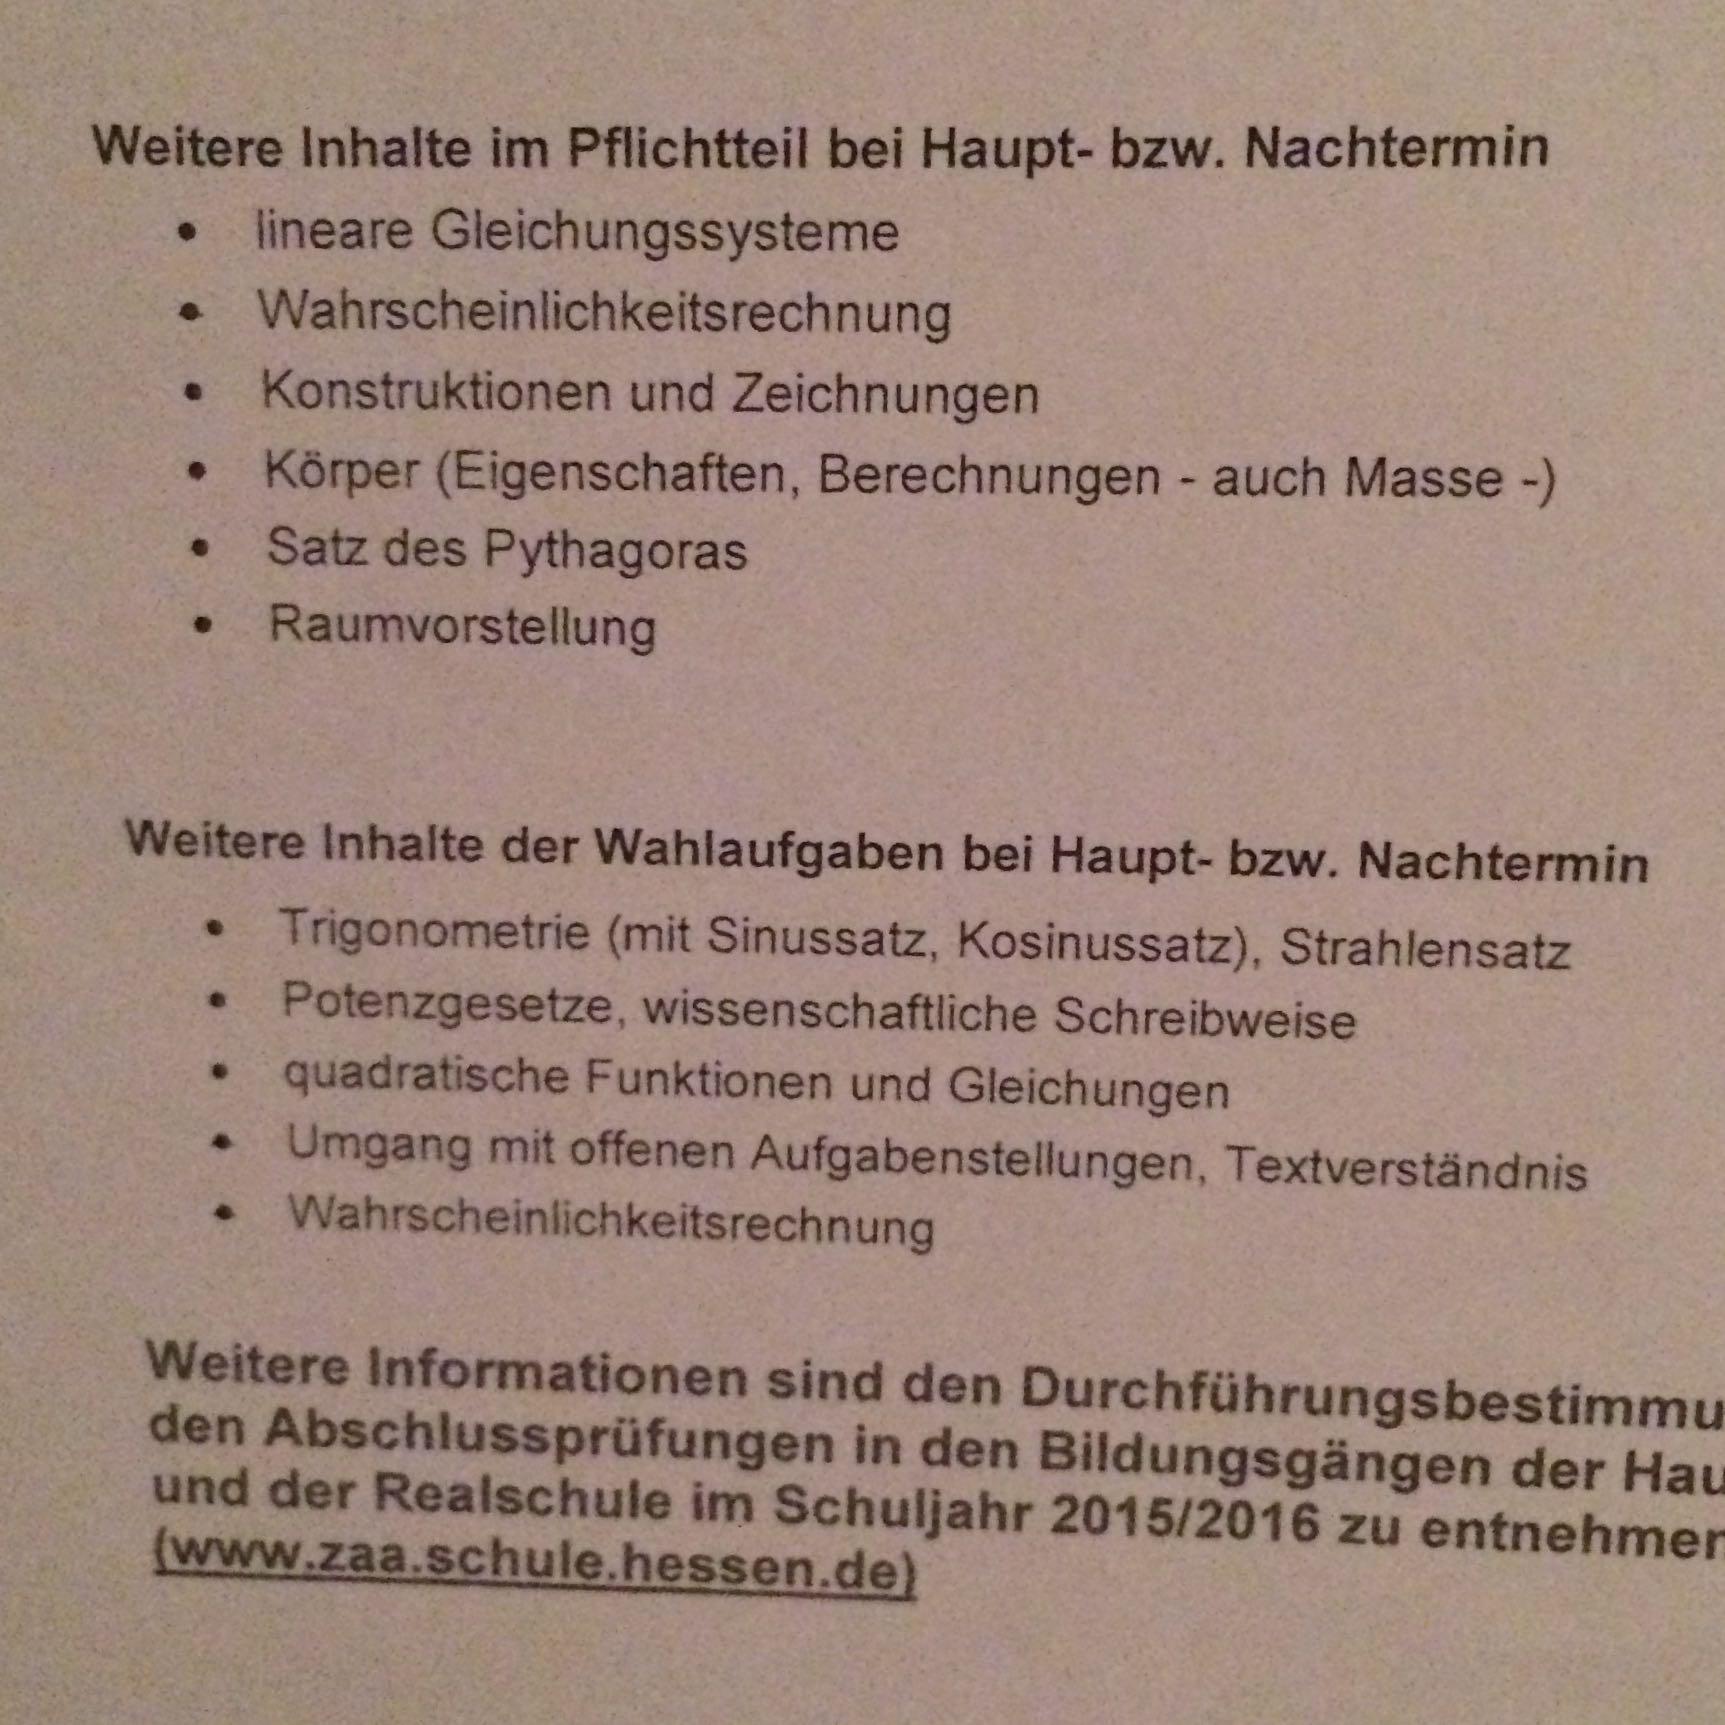 Zentrale Abschlussprüfungen Realschule Hessen 2016? (Schule)